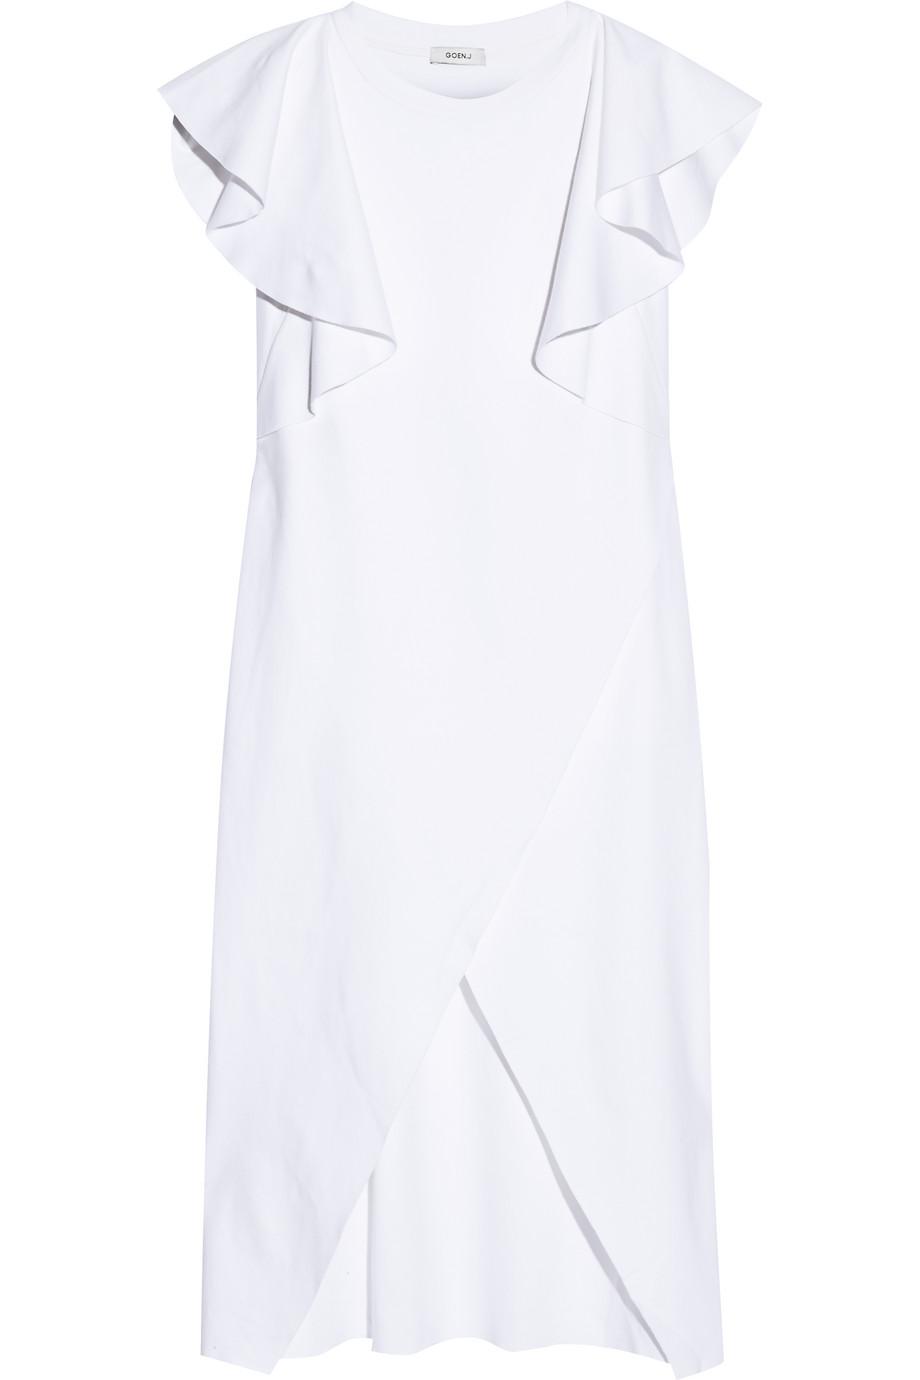 Ruffled Cotton-Jersey Midi Dress, White, Women's - Metallic, Size: S